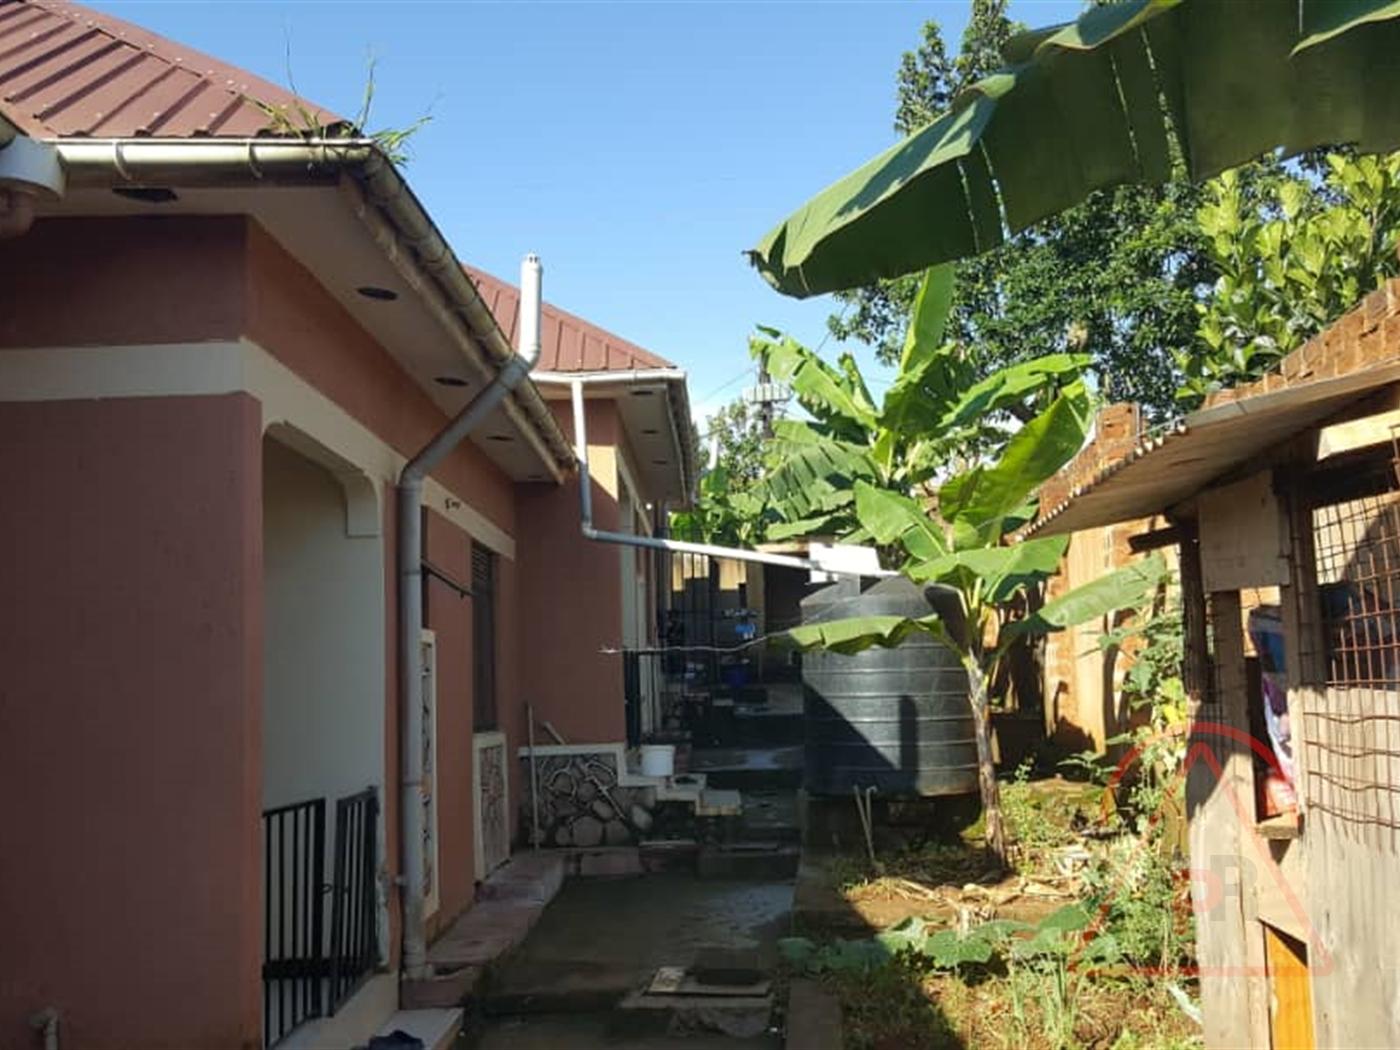 Mansion for sale in Muyenga Kampala